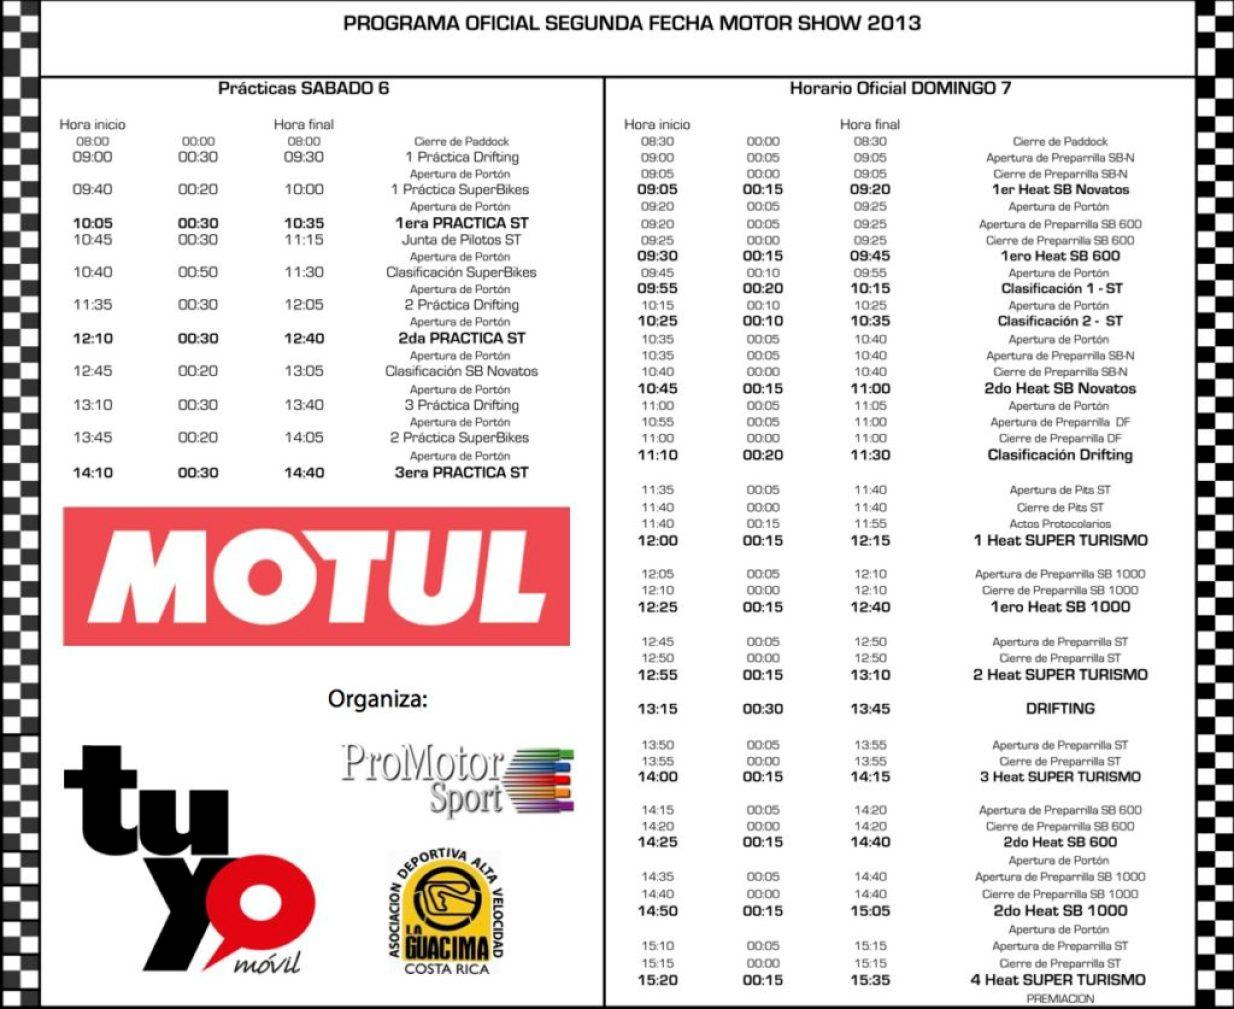 Programa Segunda Fecha MotorShow Motul 2013